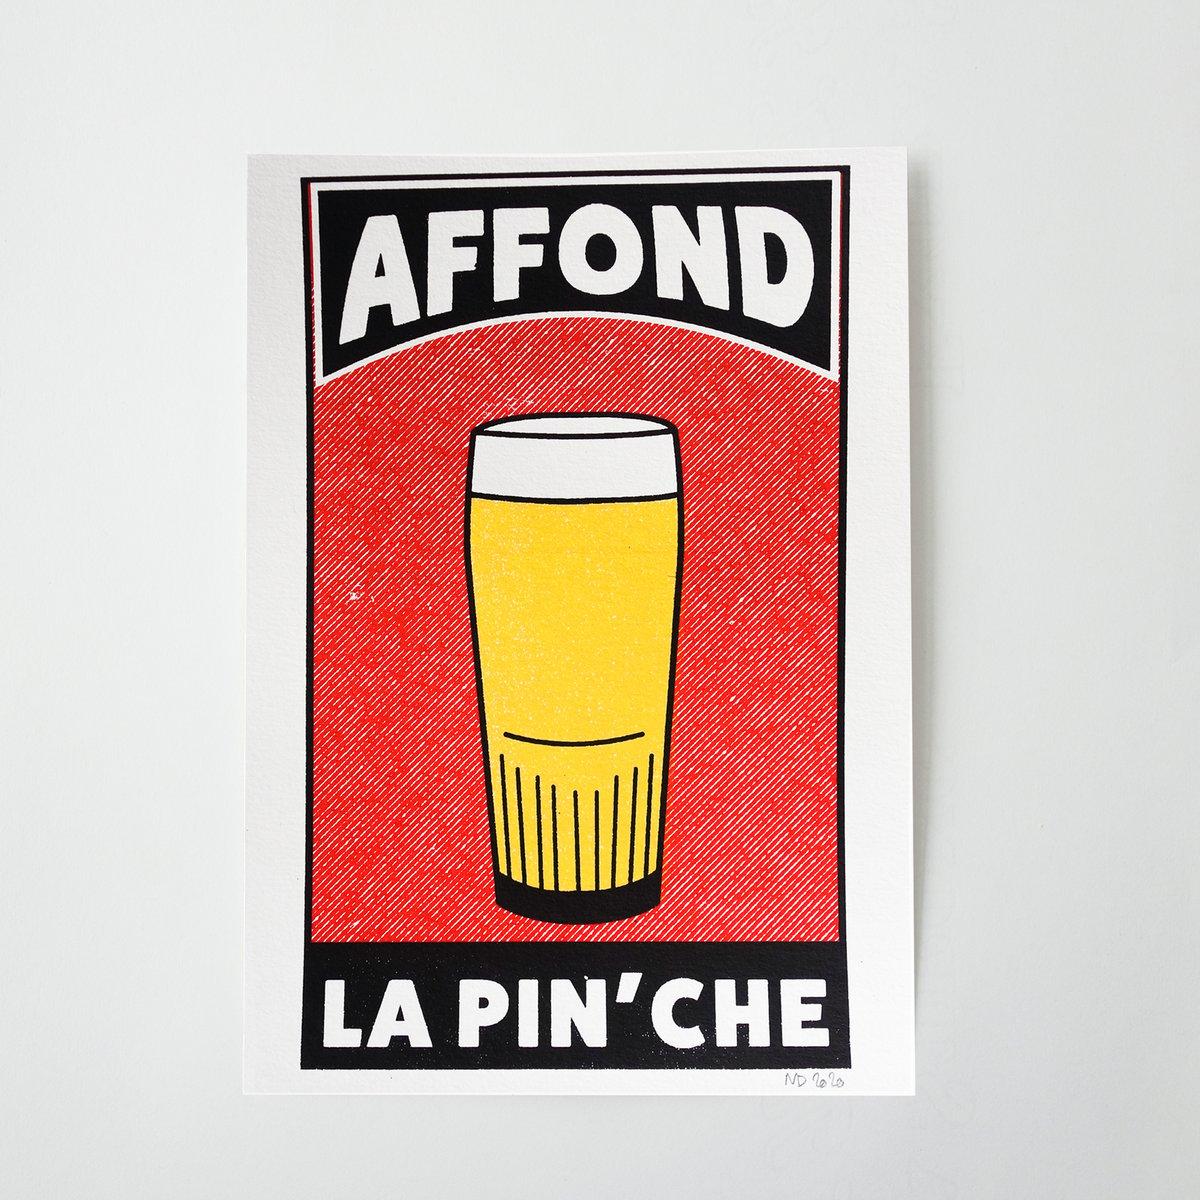 Mini frites / gaufre / chouke / soleil / moule / pinche